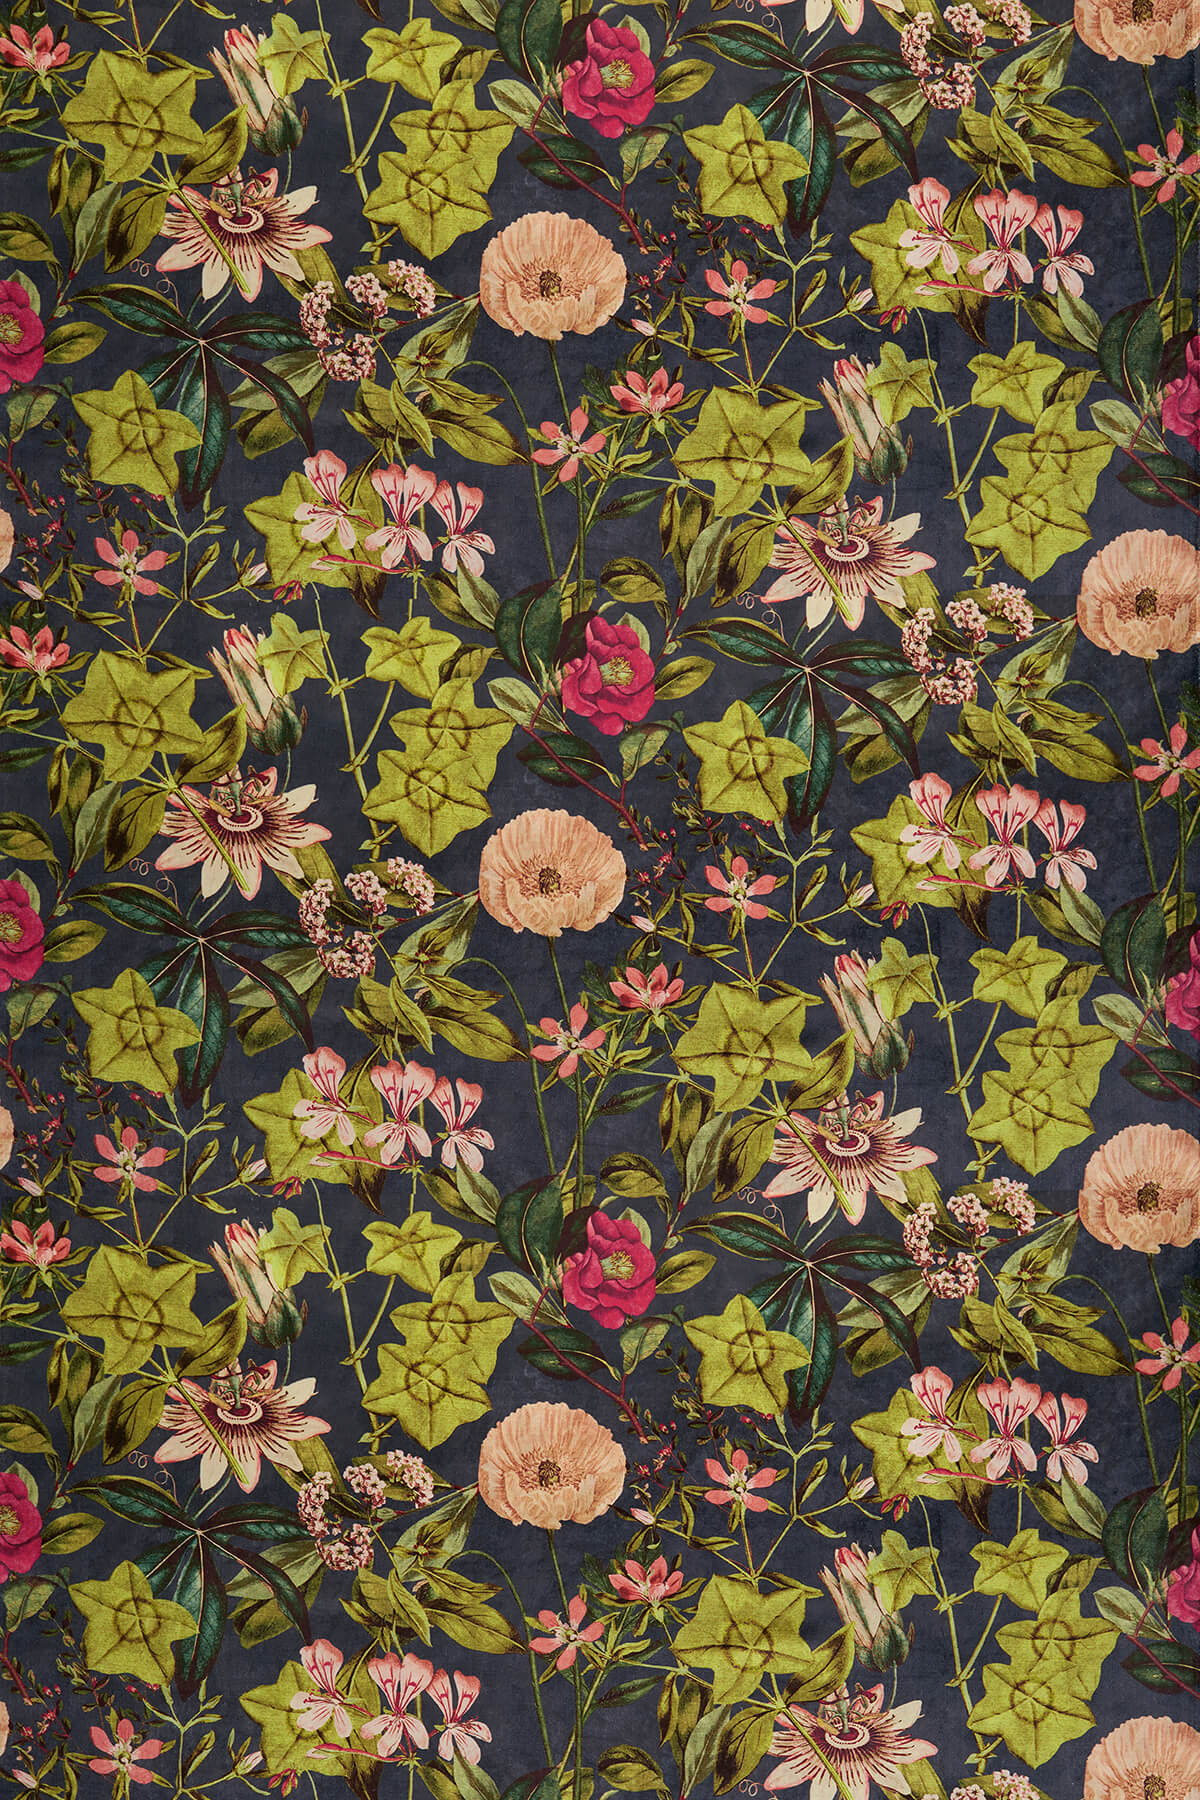 Passiflora Fabric - Midnight / Spice - by Clarke & Clarke